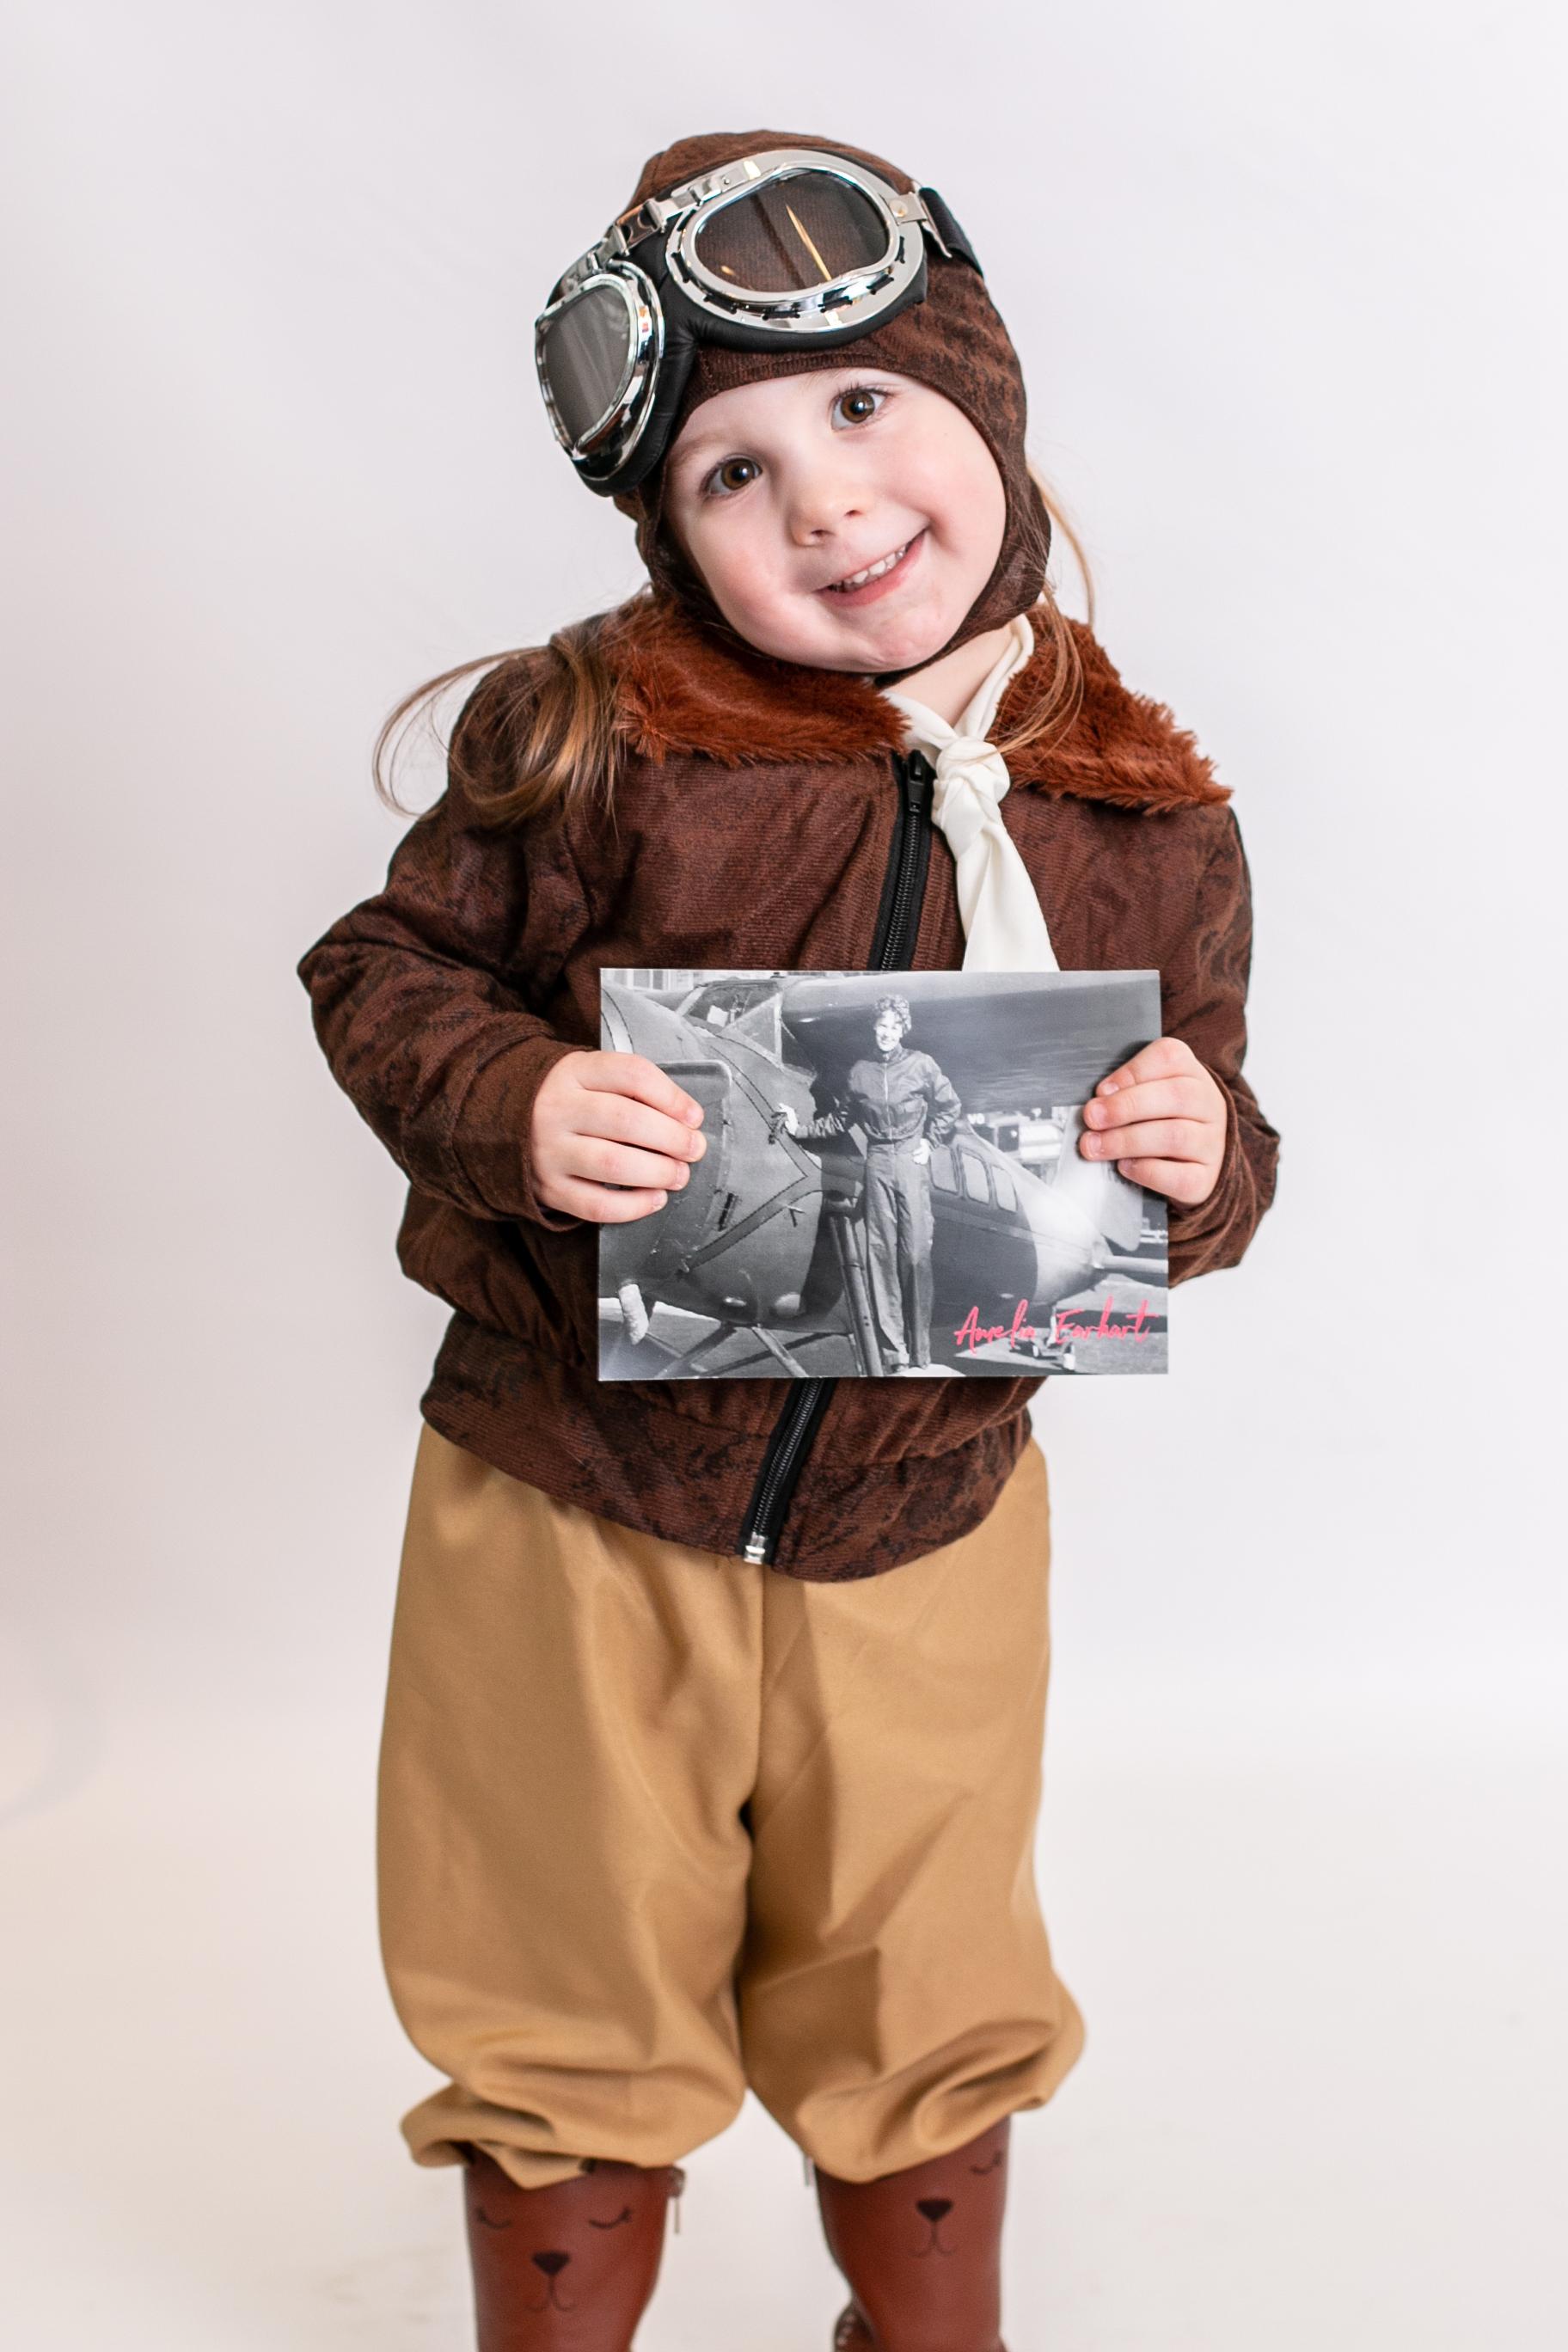 Girl dressed as Amelia Earhart for International Women's day.jpg